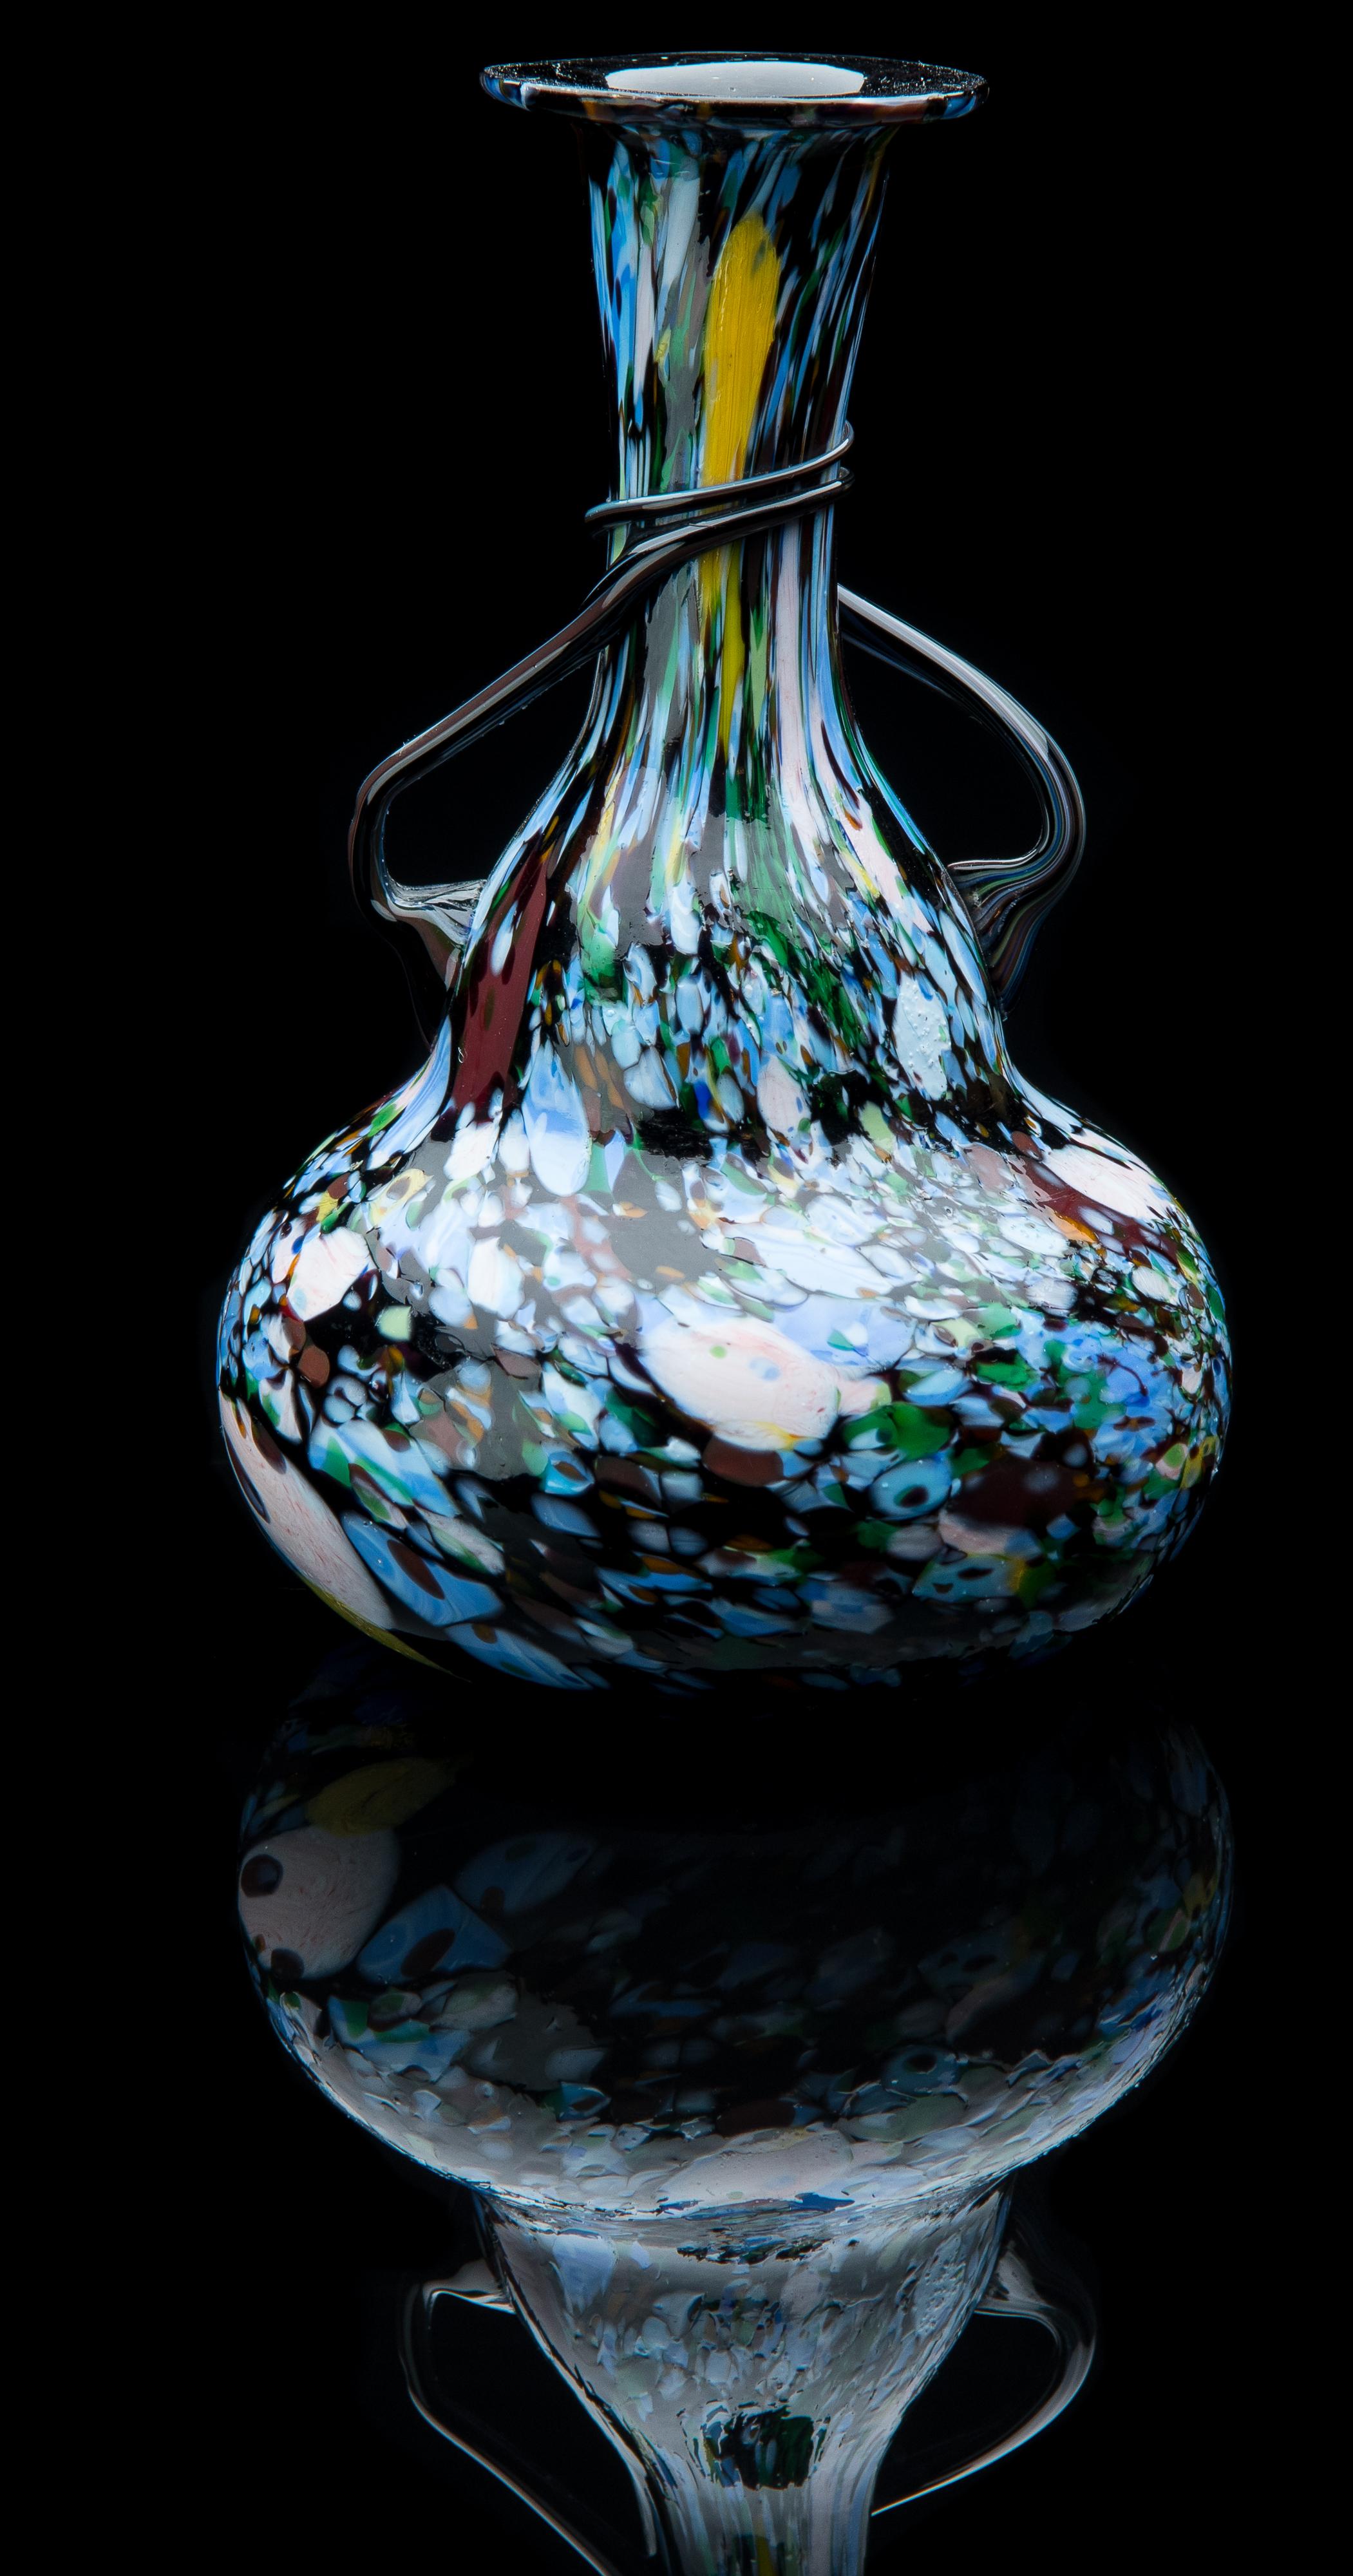 Salviati and Company,  Dappled Vase  (glass, 6 inches), VV.949